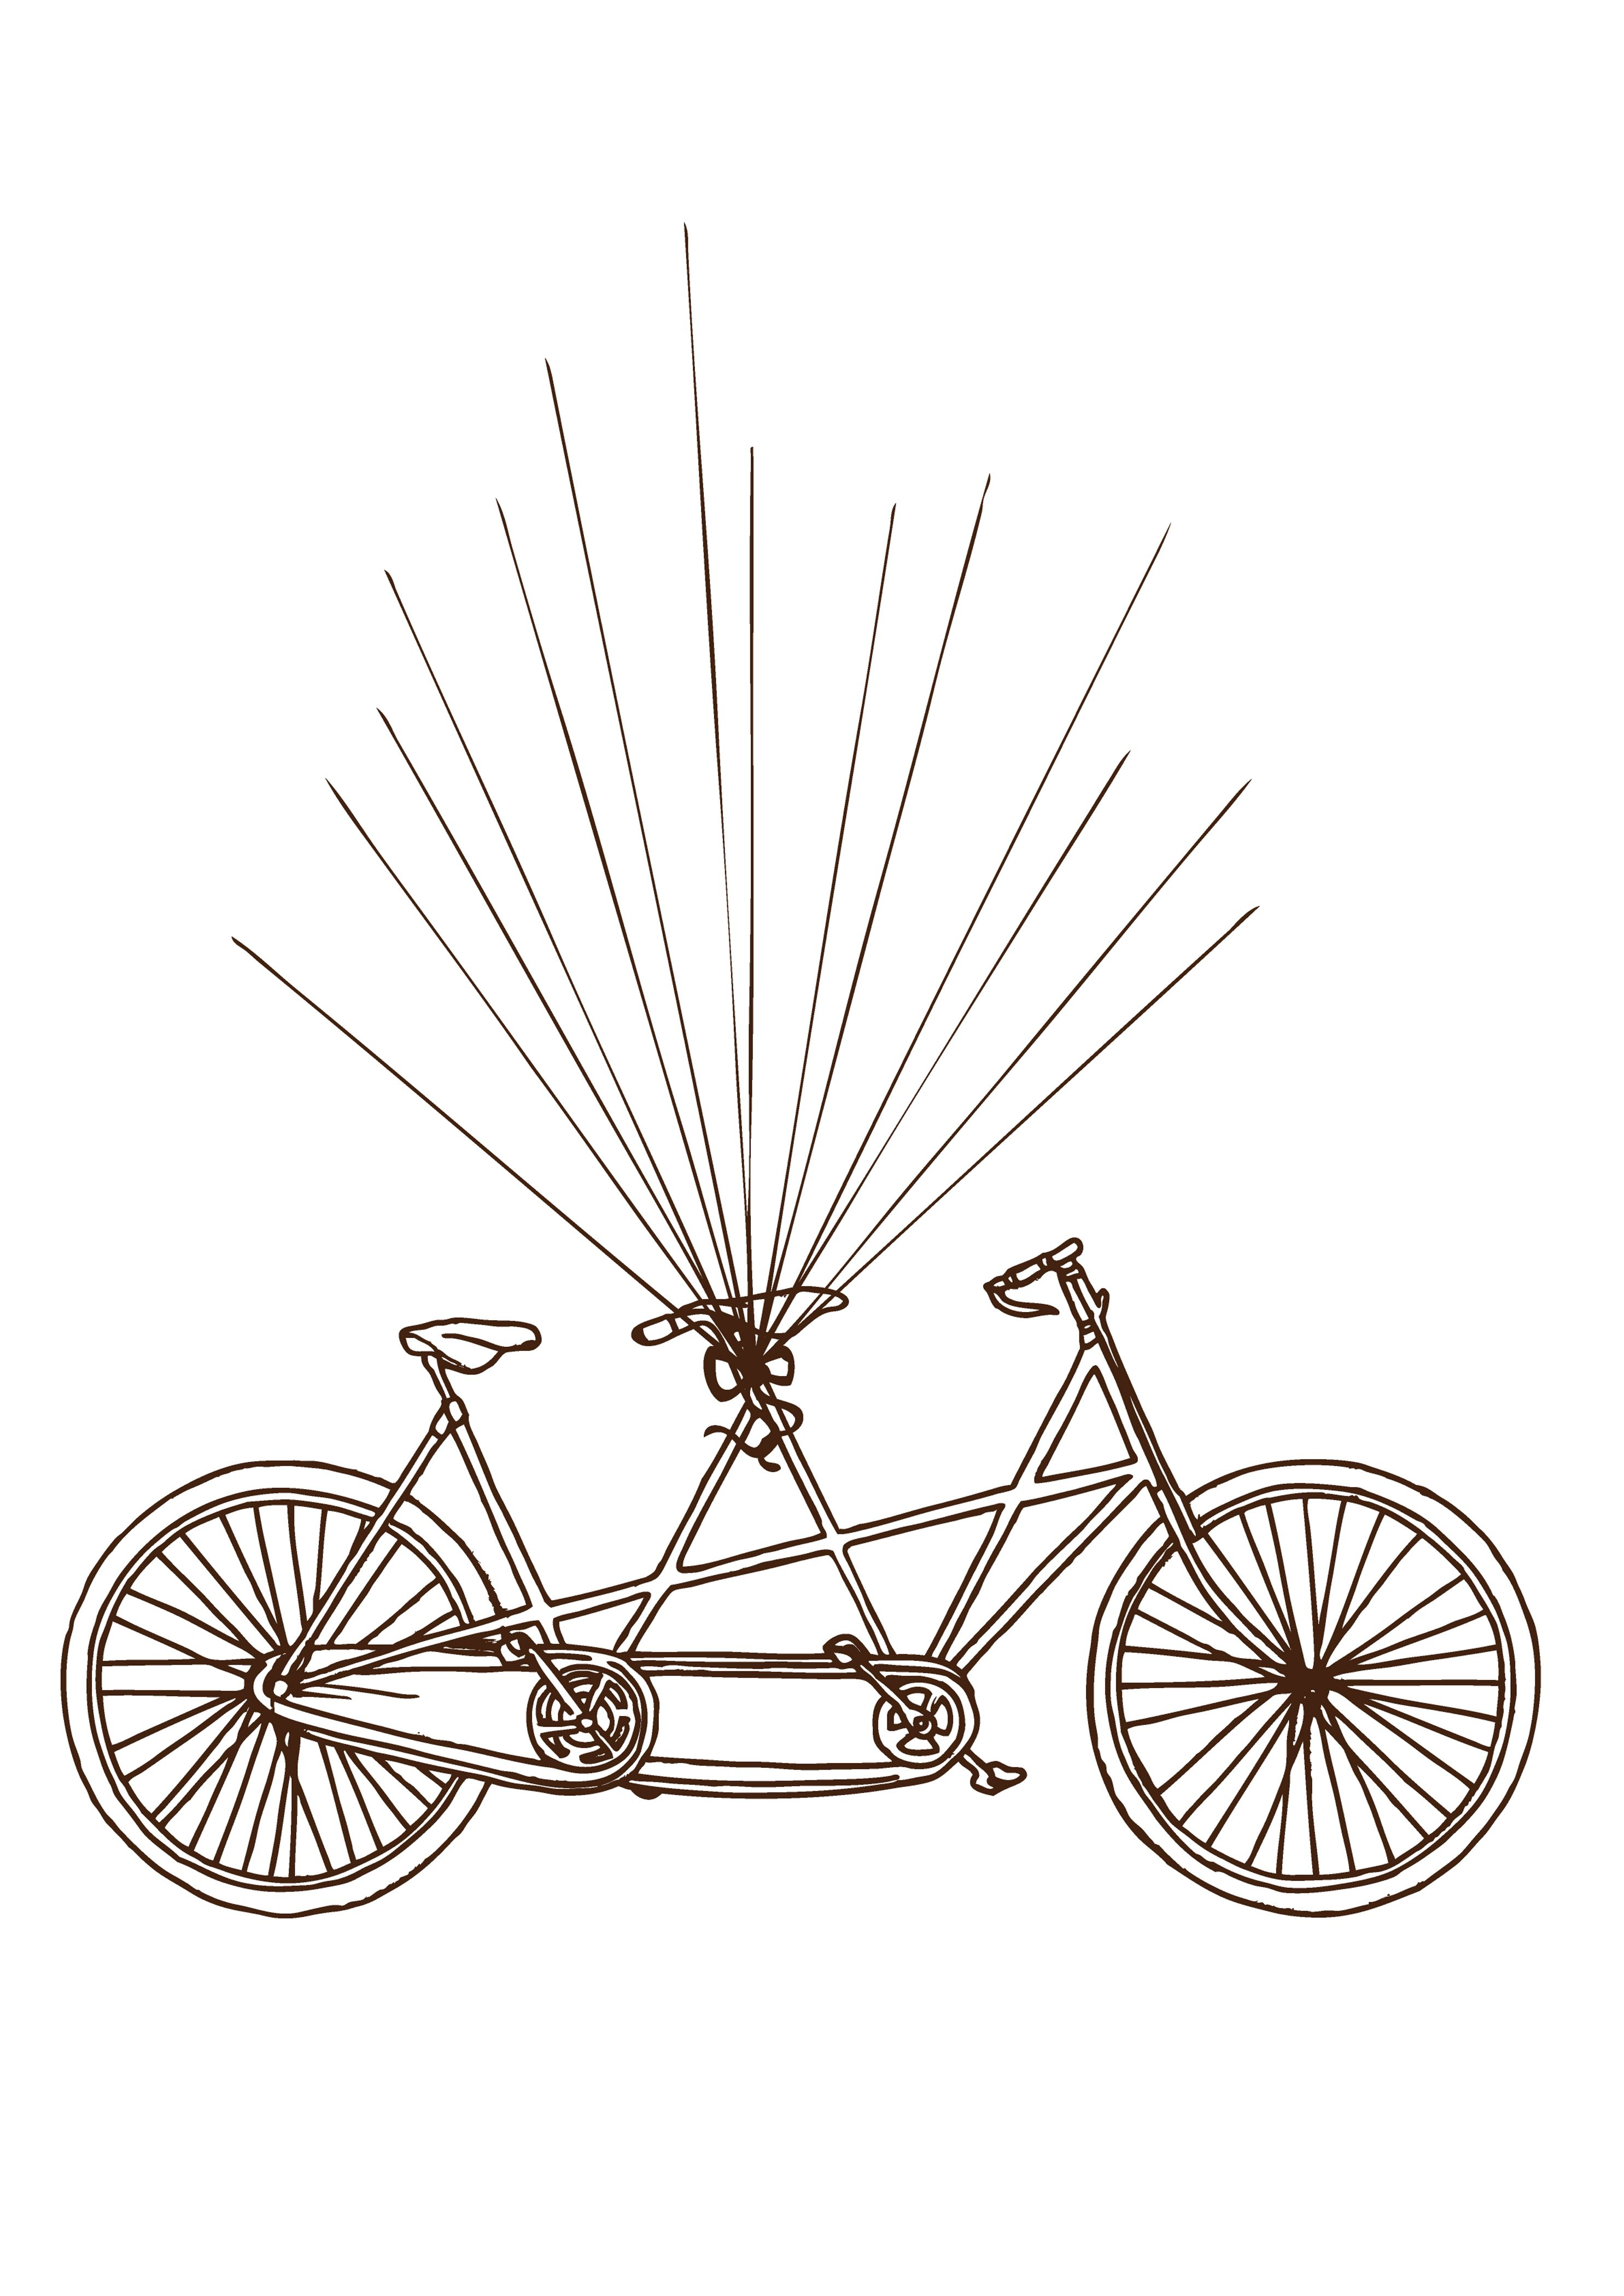 Fotografodebodaenvizcaya Files Wordpress Com 2014 02 Bicicleta Preparada A3 Chocolate Jpg Bisiklet Boyama Boyama Sayfalari Cocuklar Icin Sanat